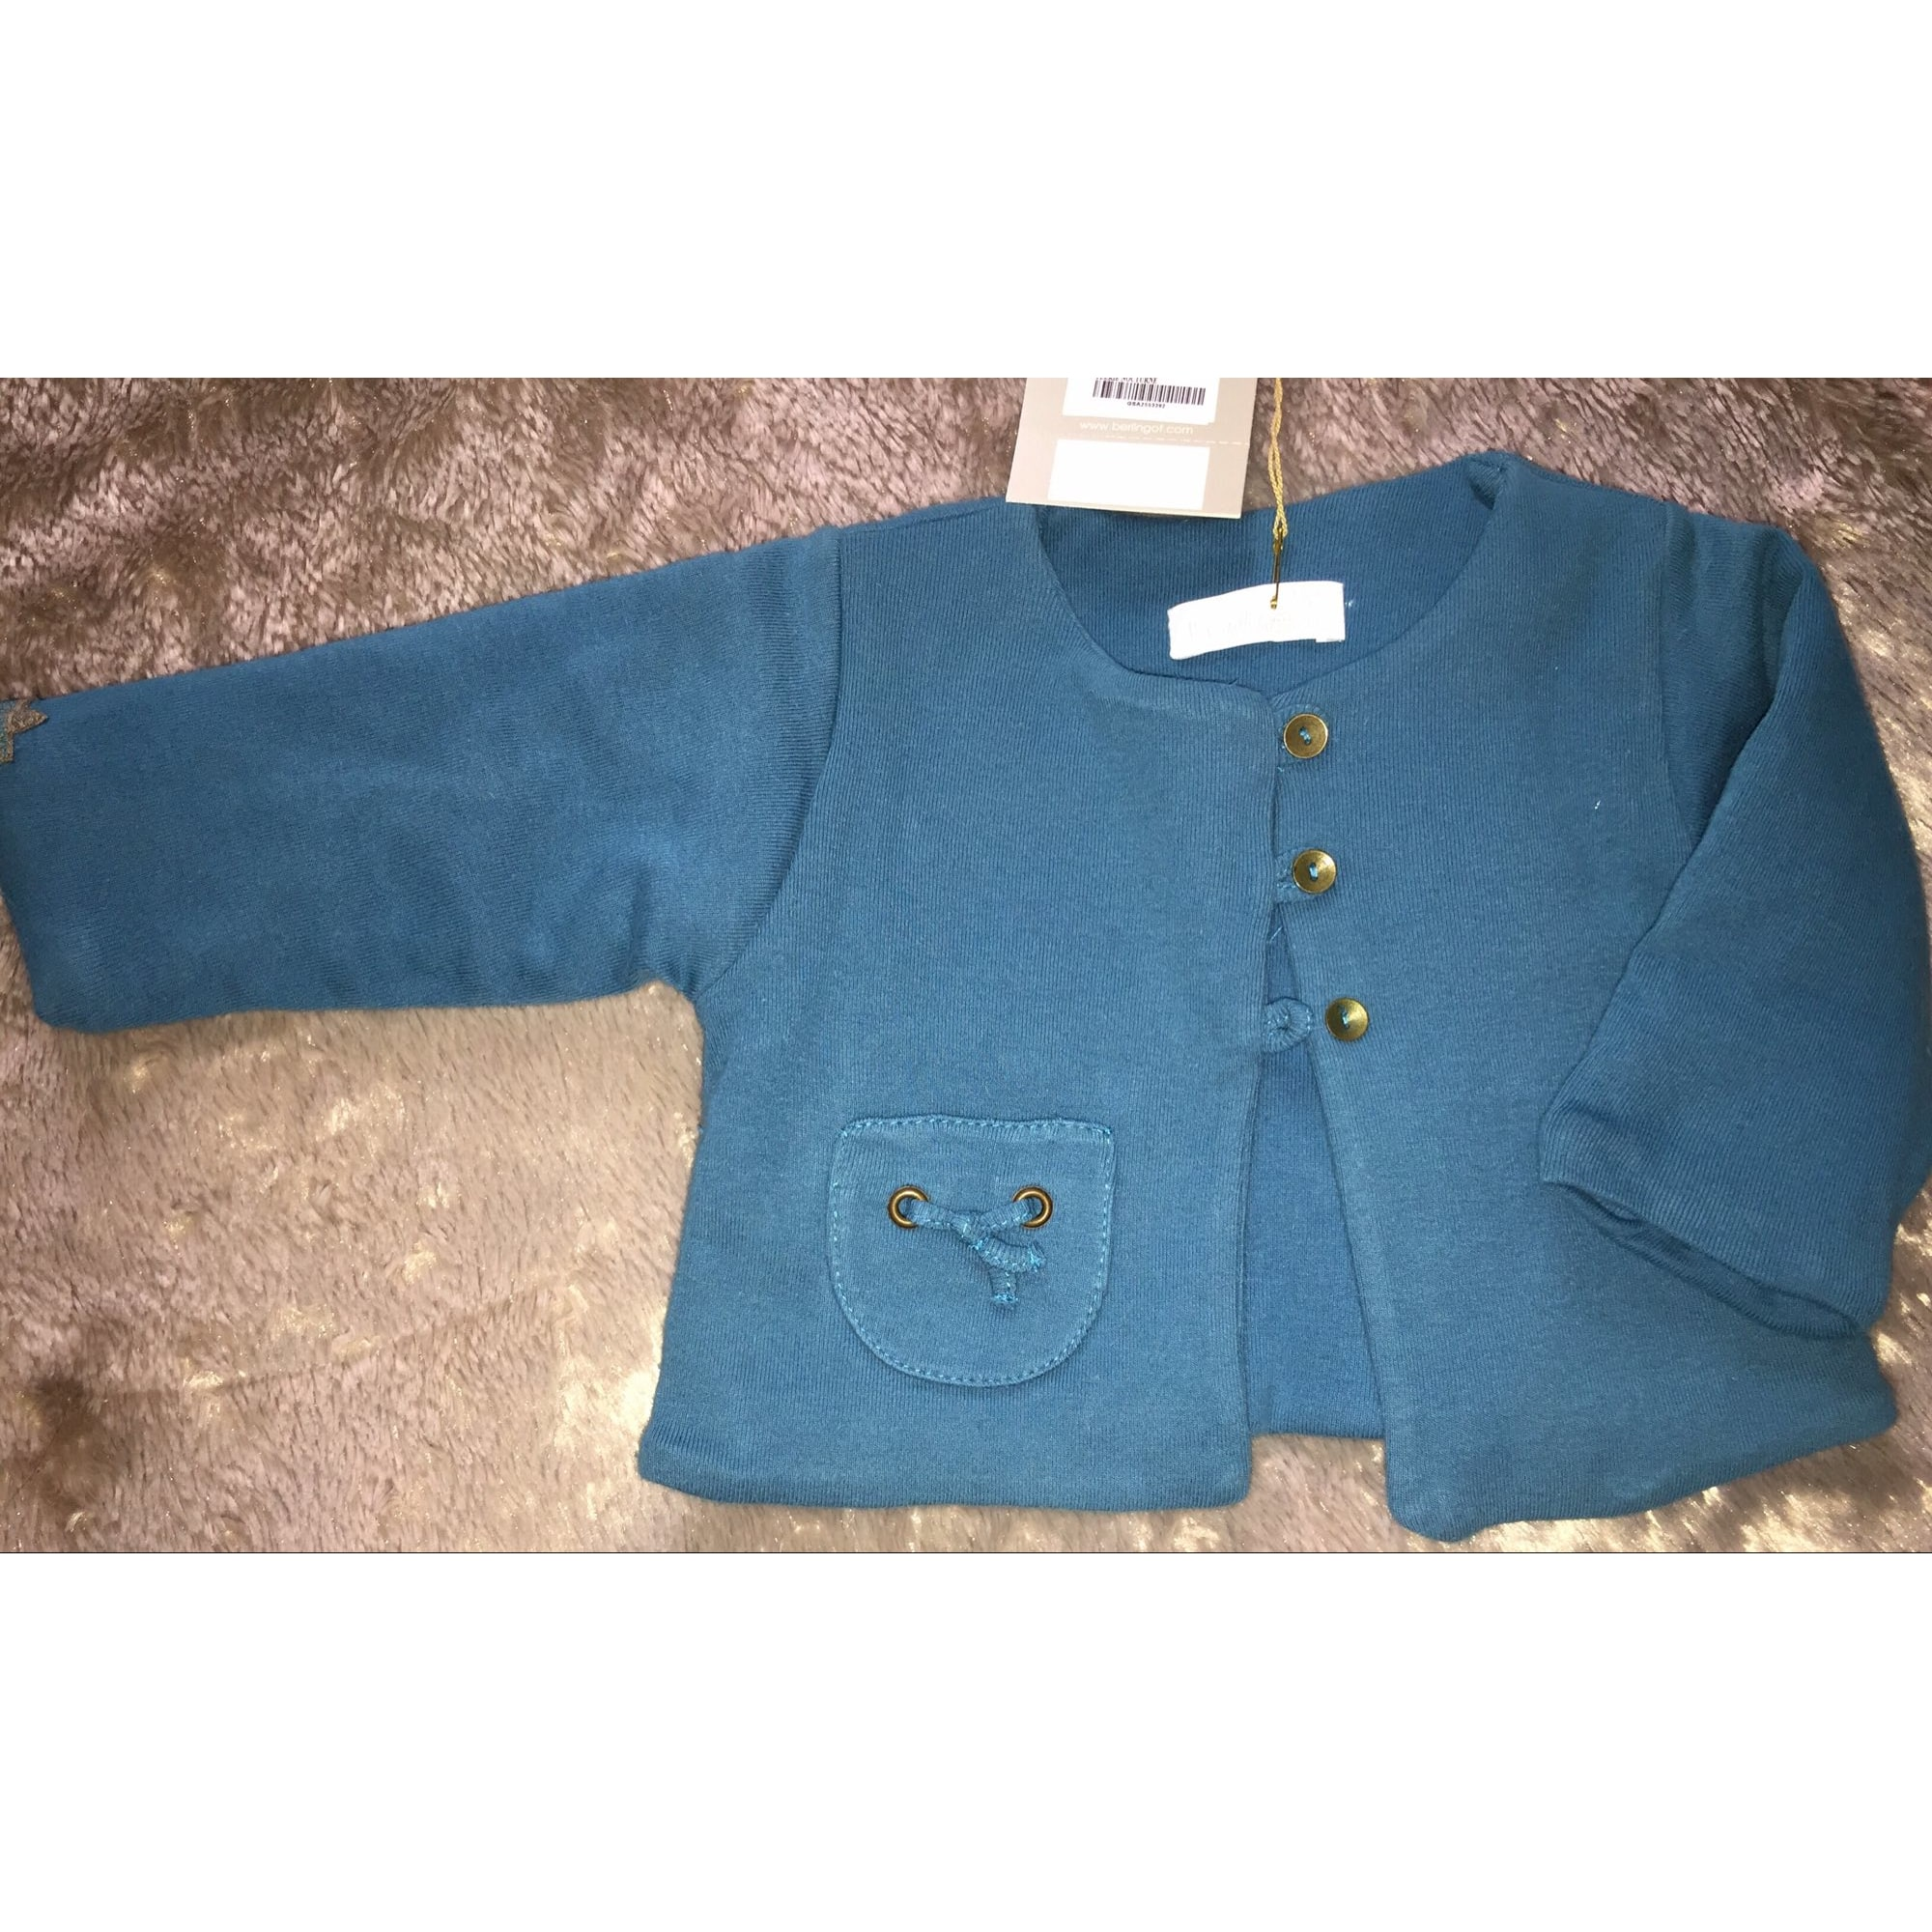 Veste BERLINGOT Bleu canard